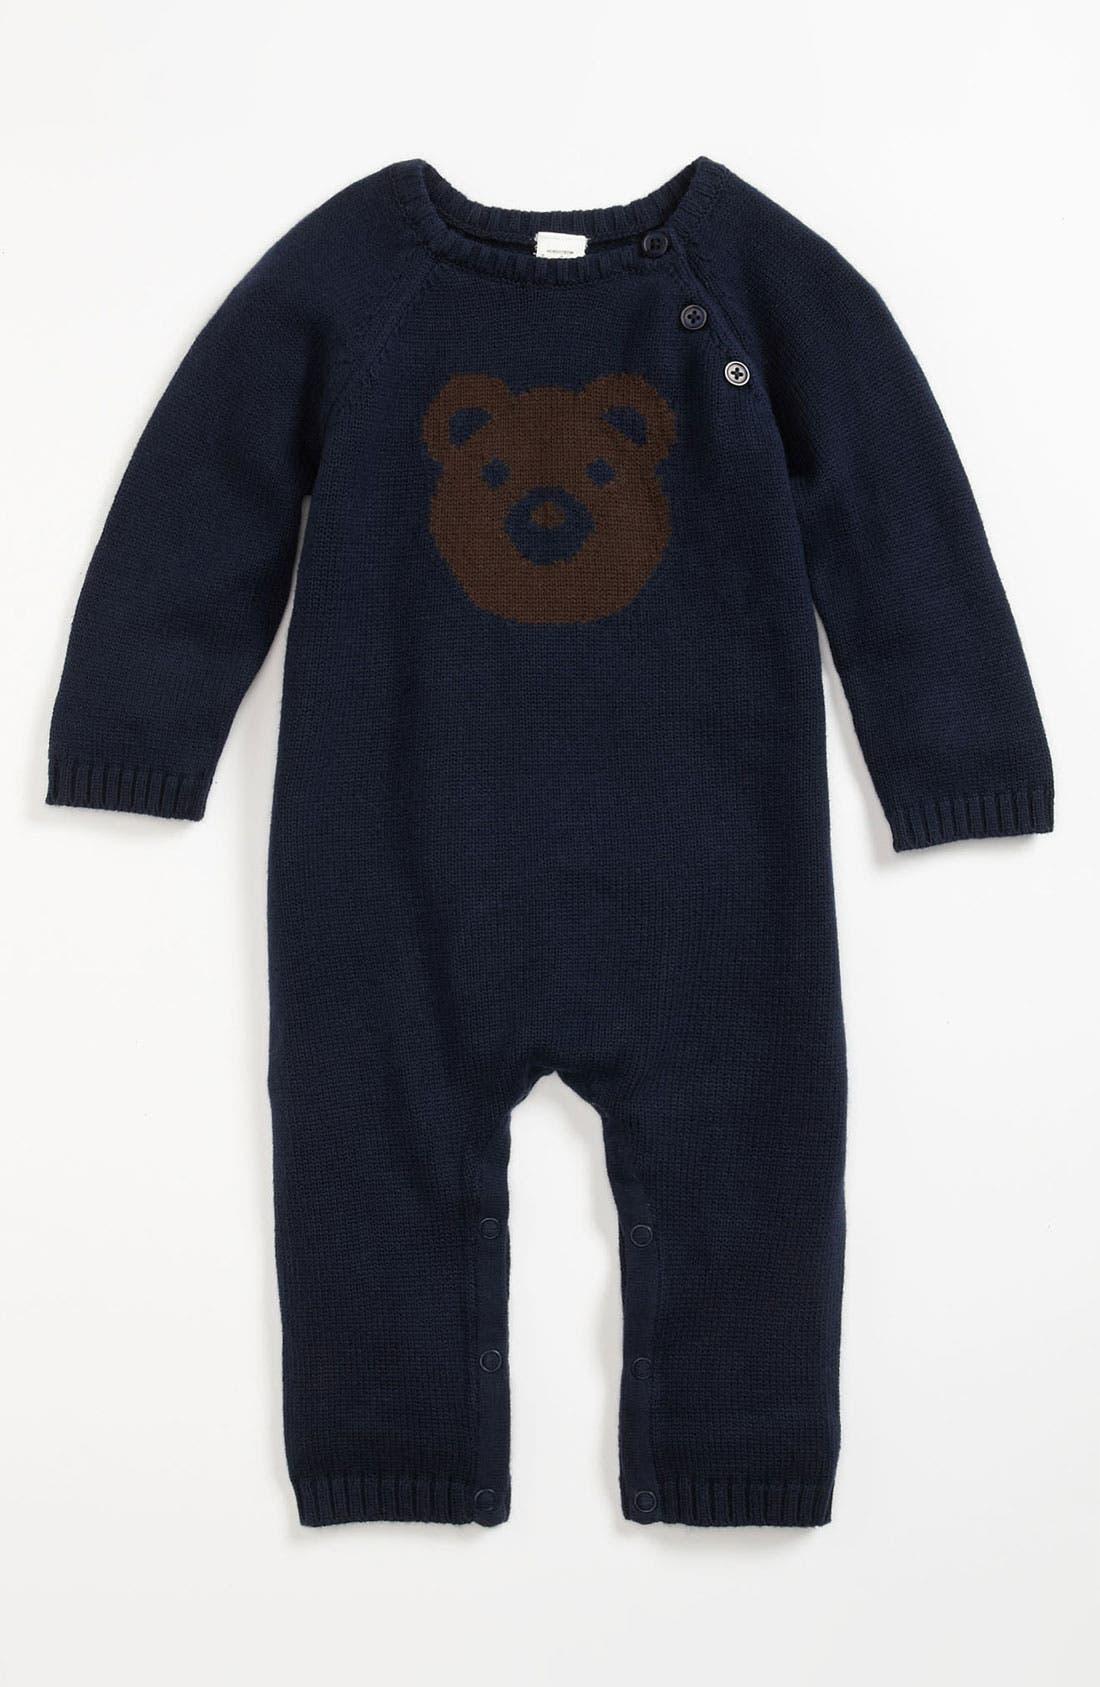 Main Image - Nordstrom Baby Knit Romper (Infant)